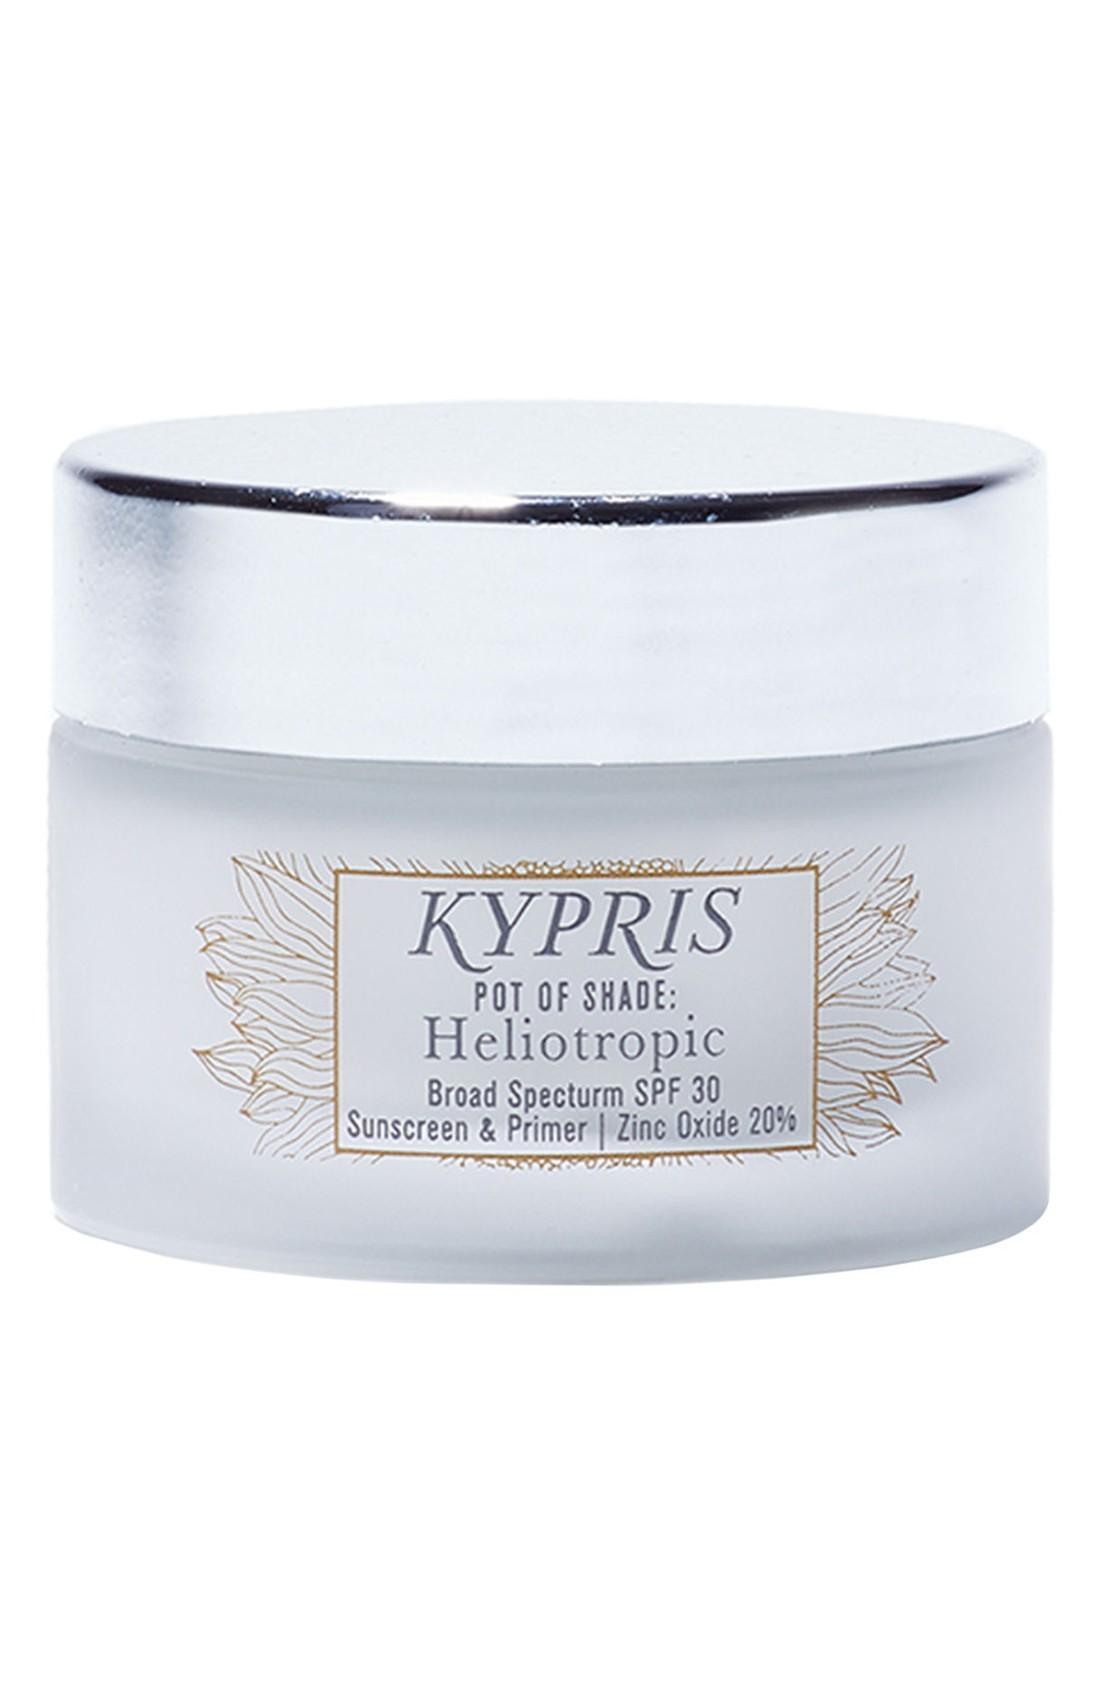 Kypris Pot of Shade: Heliotropic Primer and Sunscreen